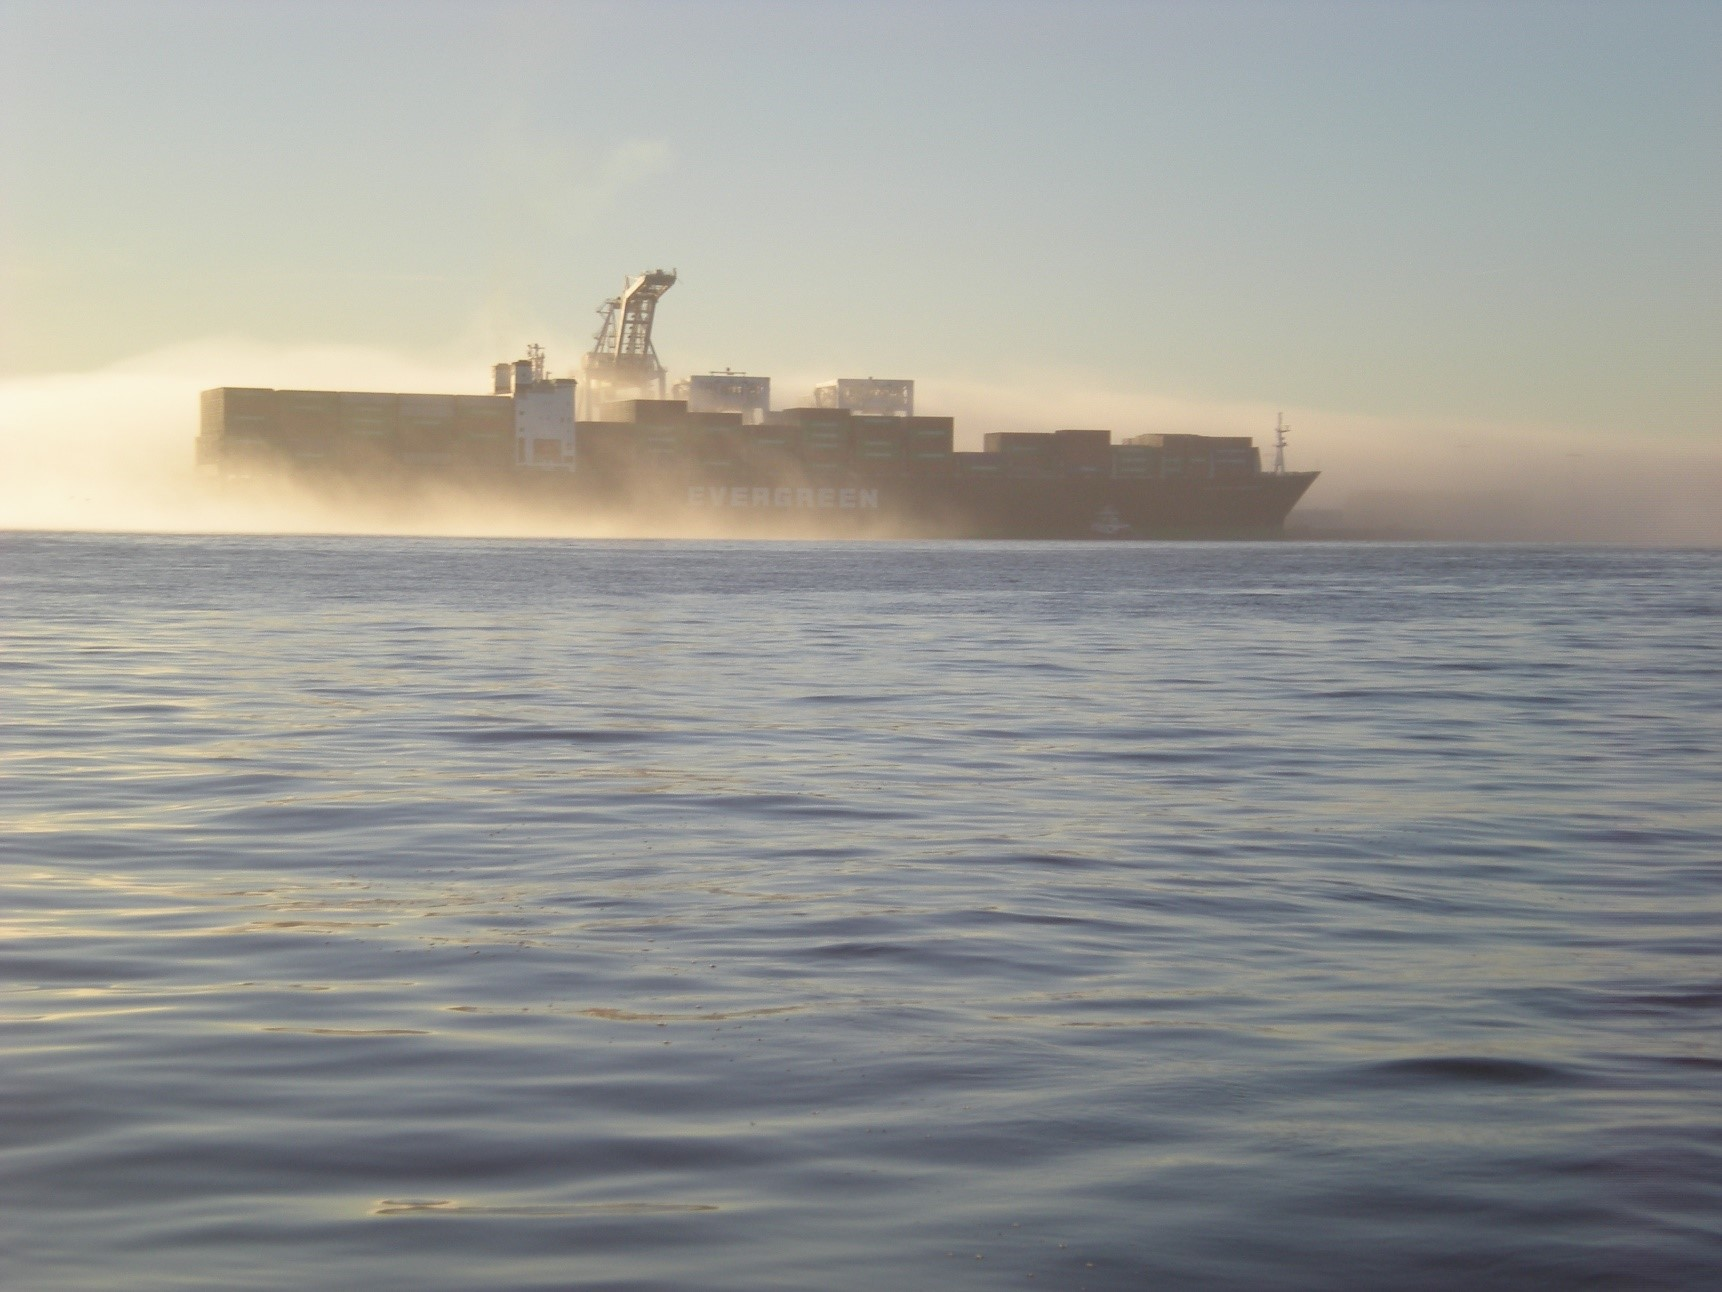 Port of Oakland Outer Harbor Berths 35/37